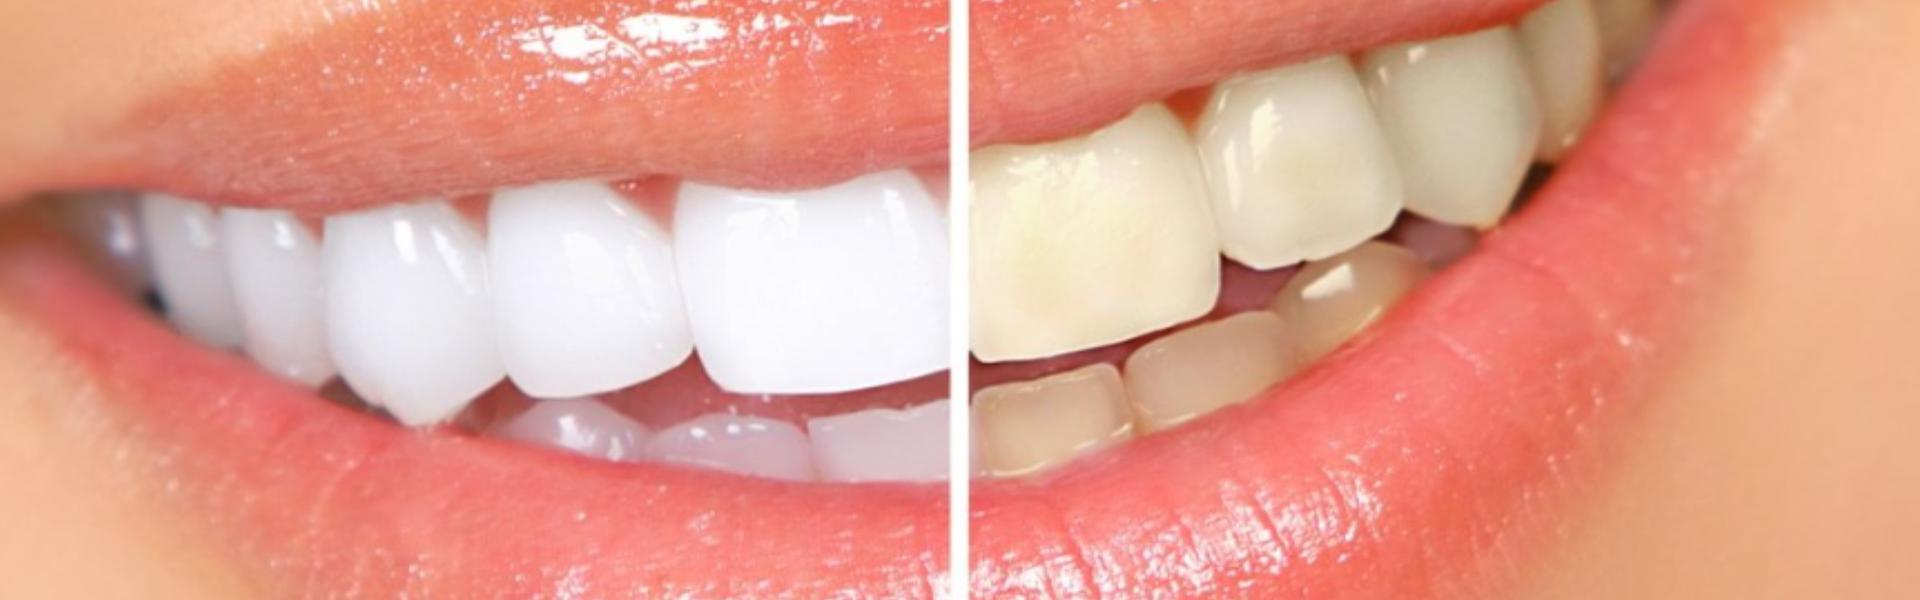 отбеливание зубов zoom фото после